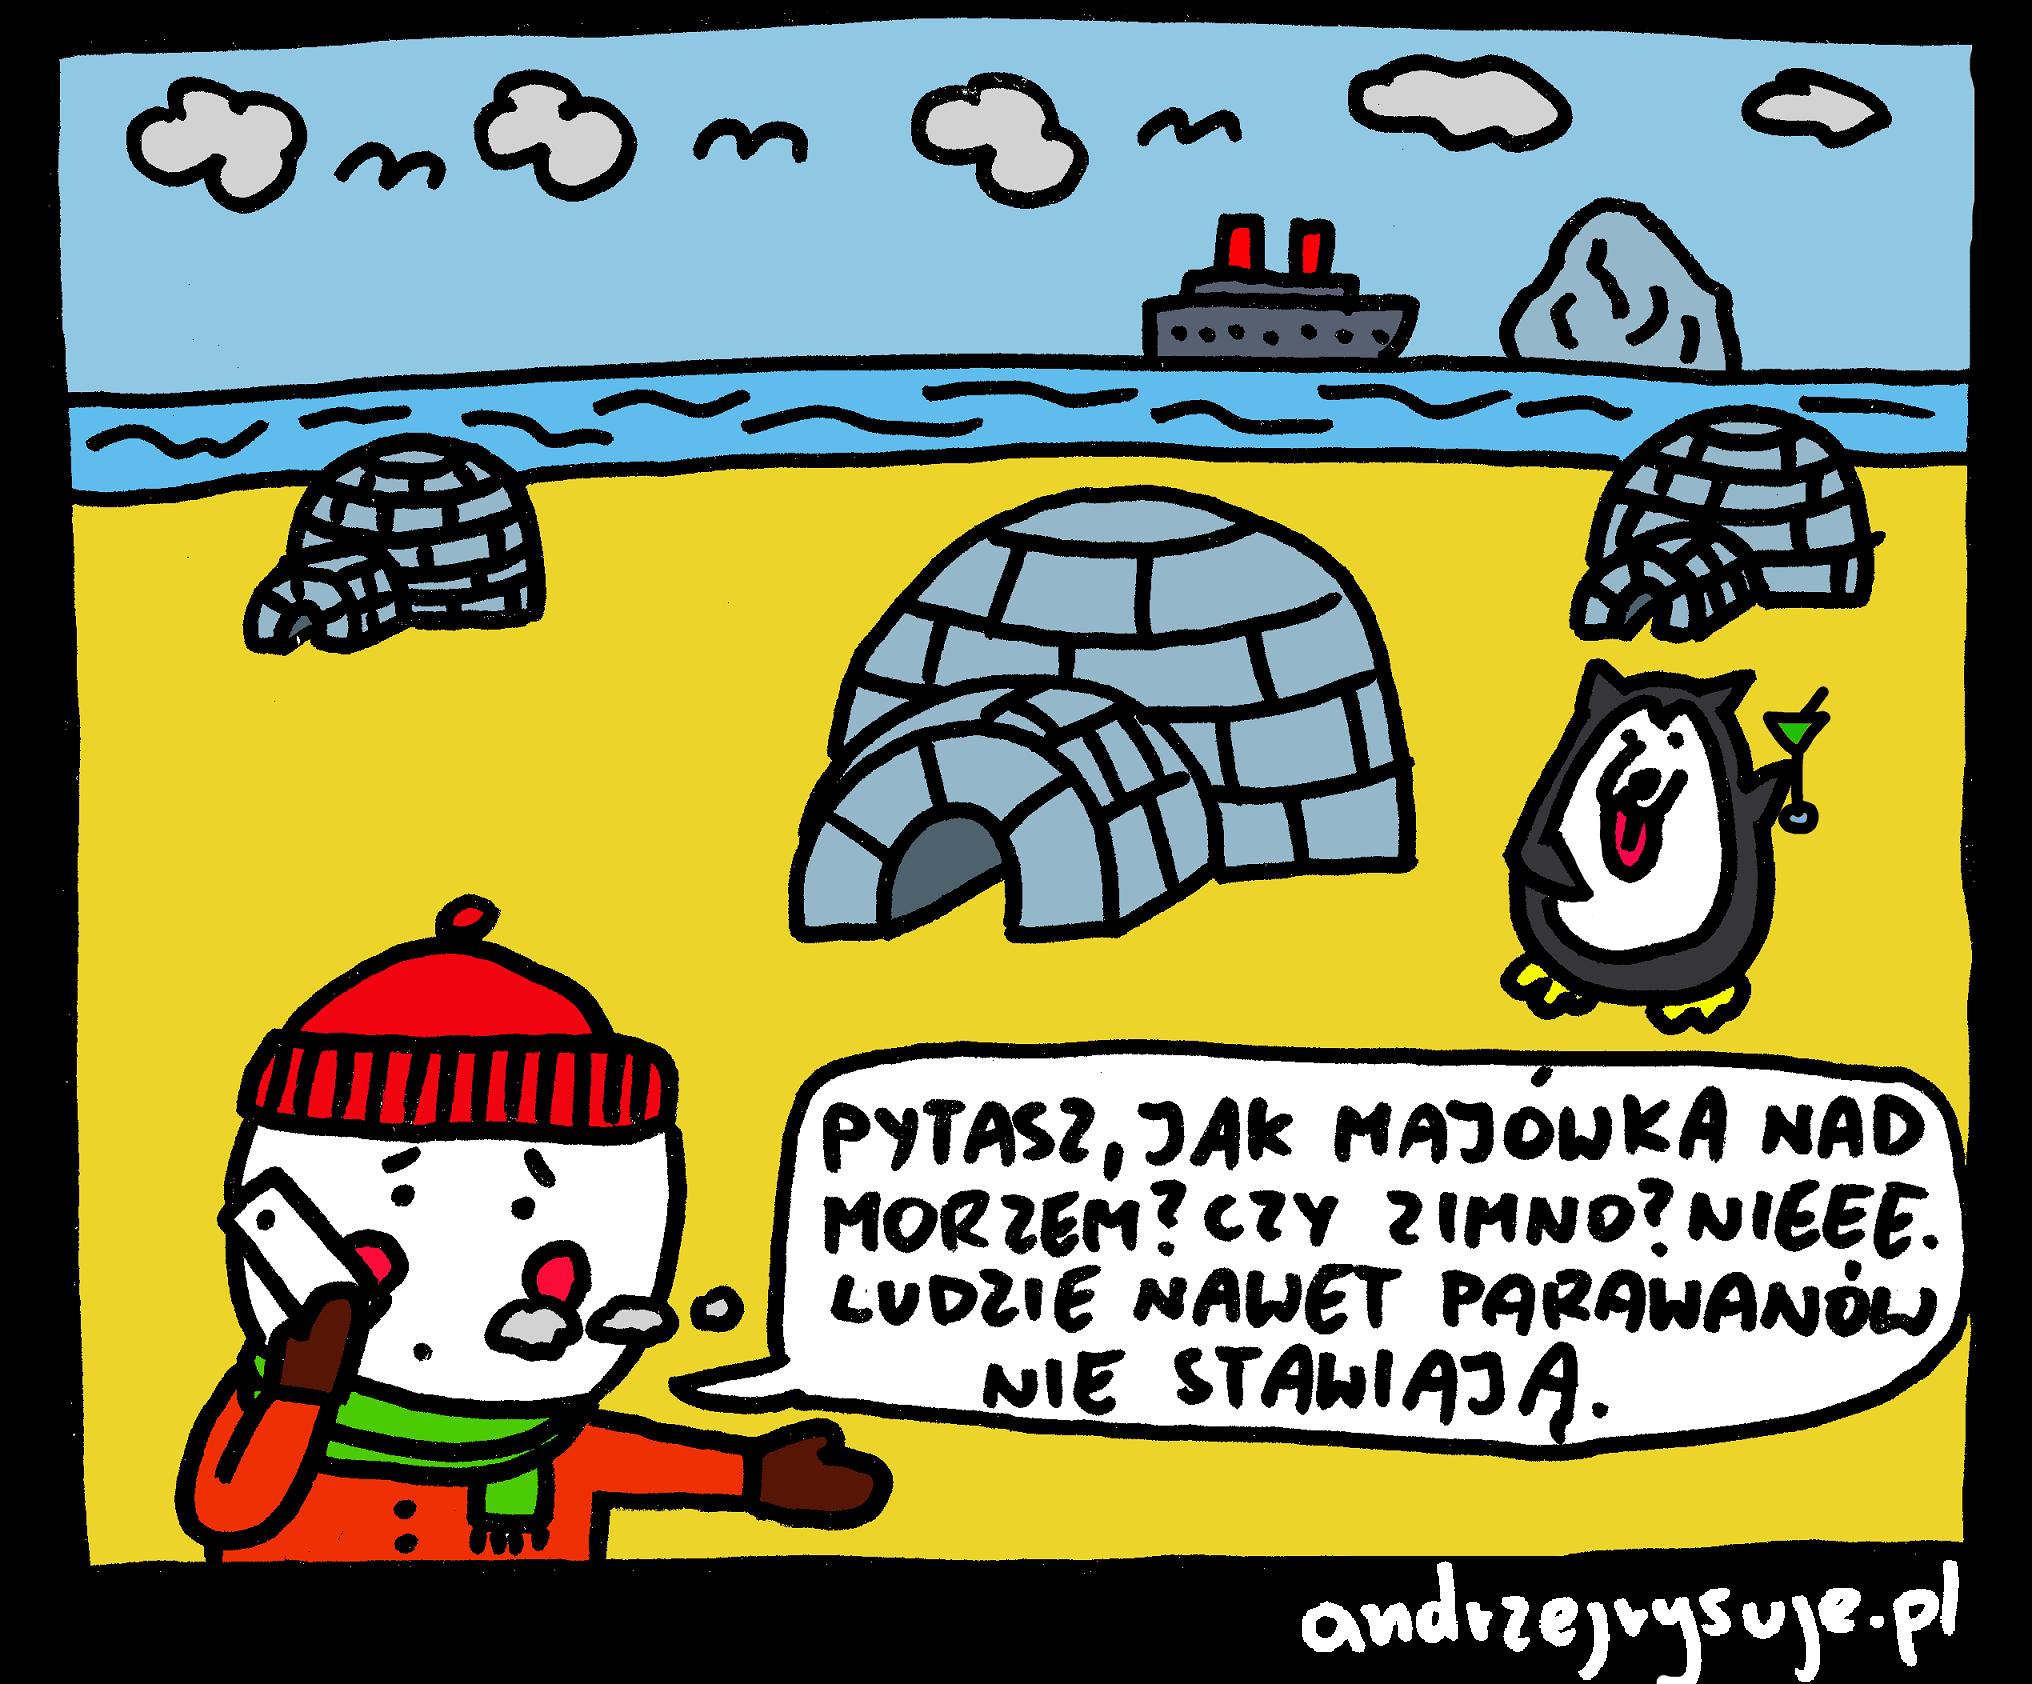 https://andrzejrysuje.pl/wp-content/uploads/2017/05/pocztowka-znad-Baltyku.png